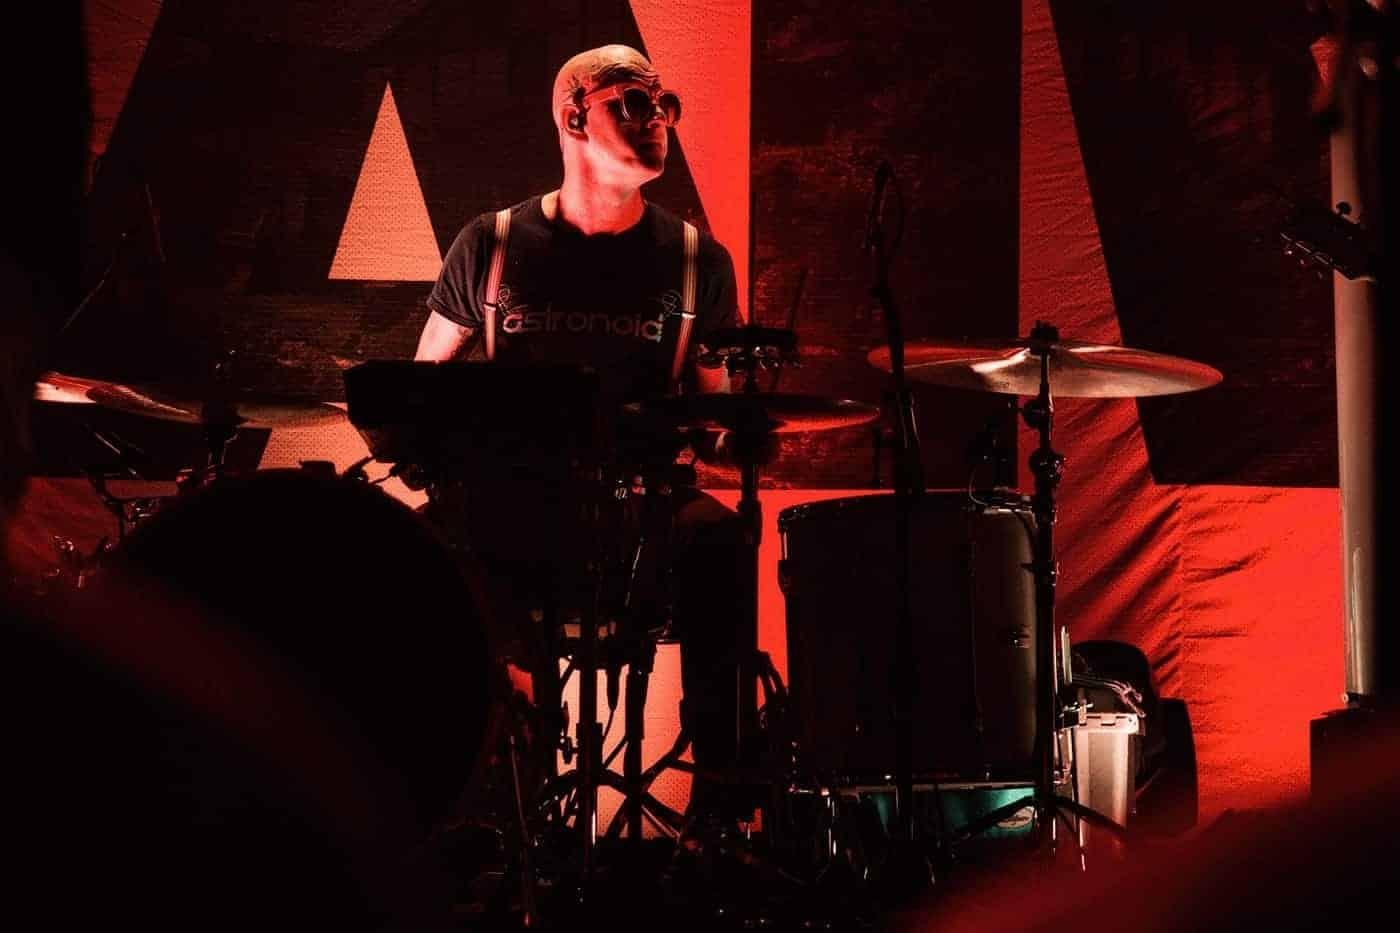 Stars Montreal drummer